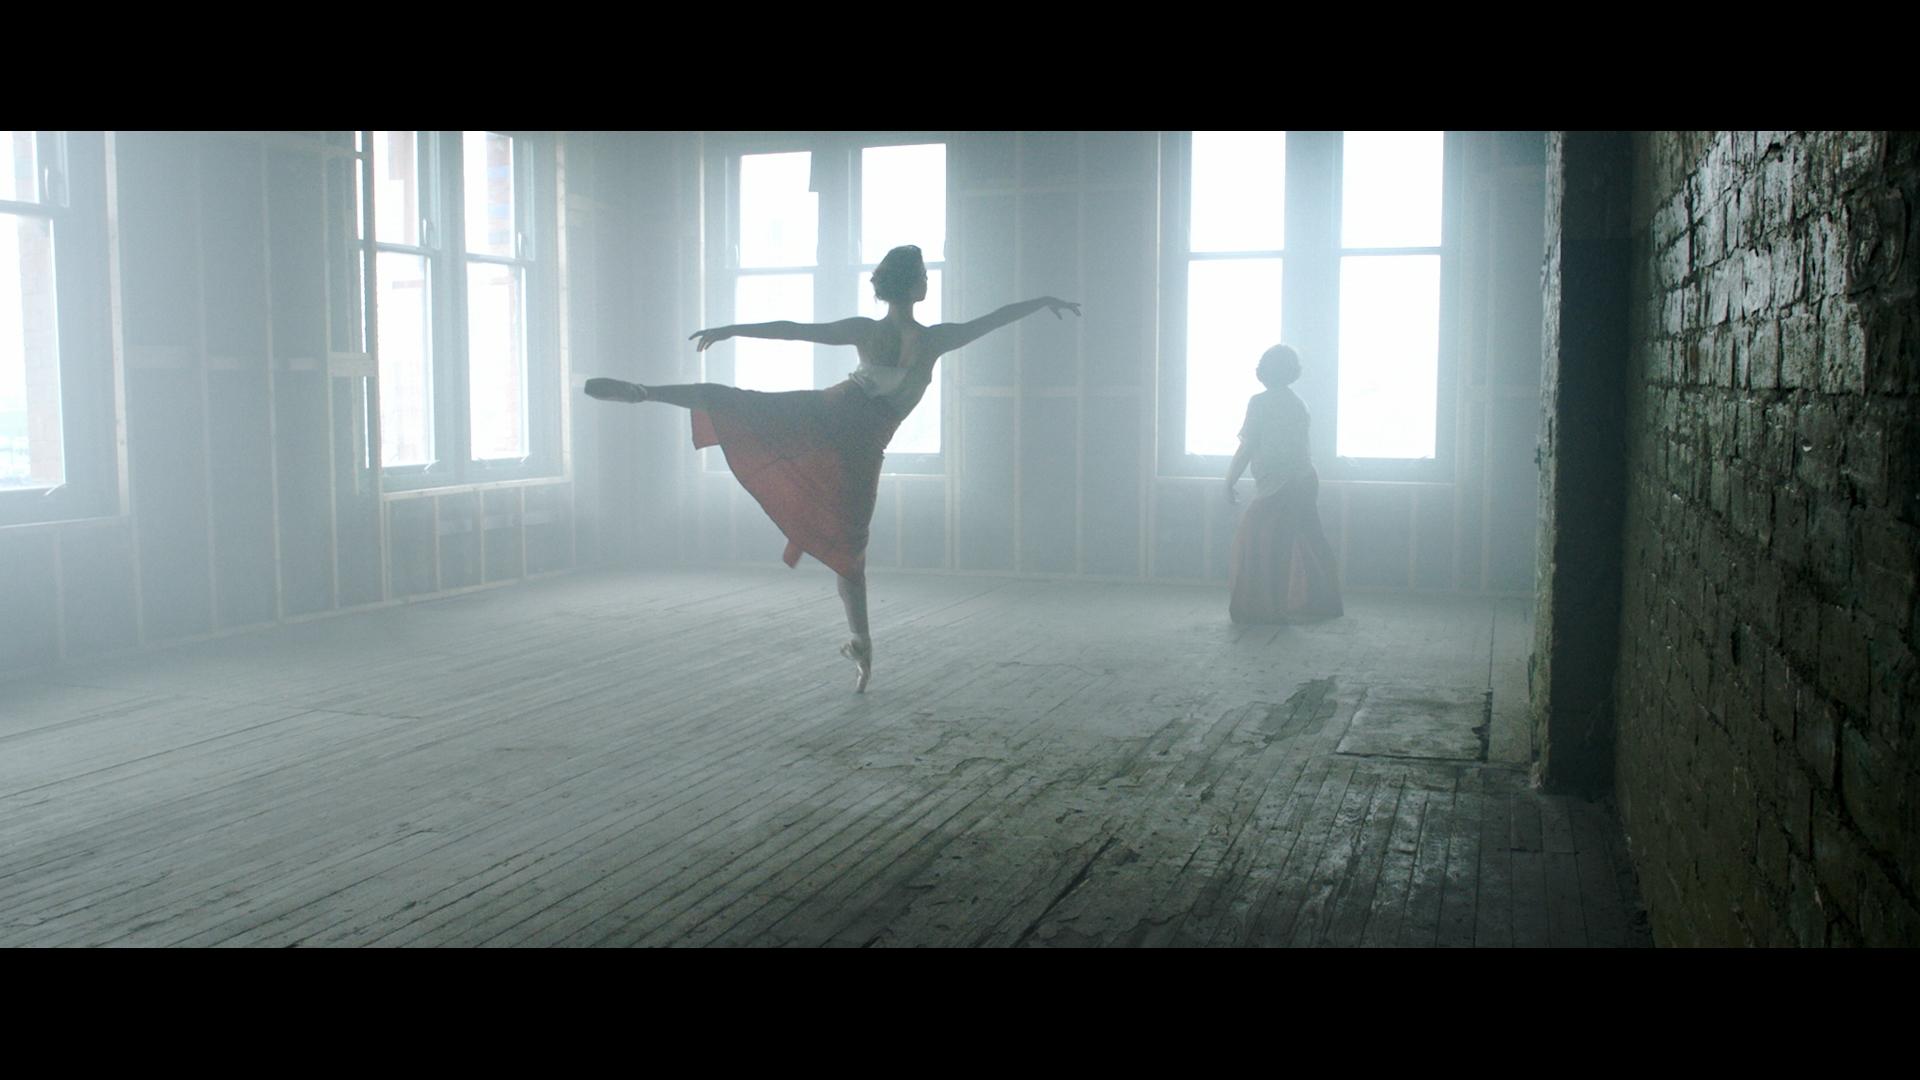 SCOTTISH BALLET - SHORT FILM